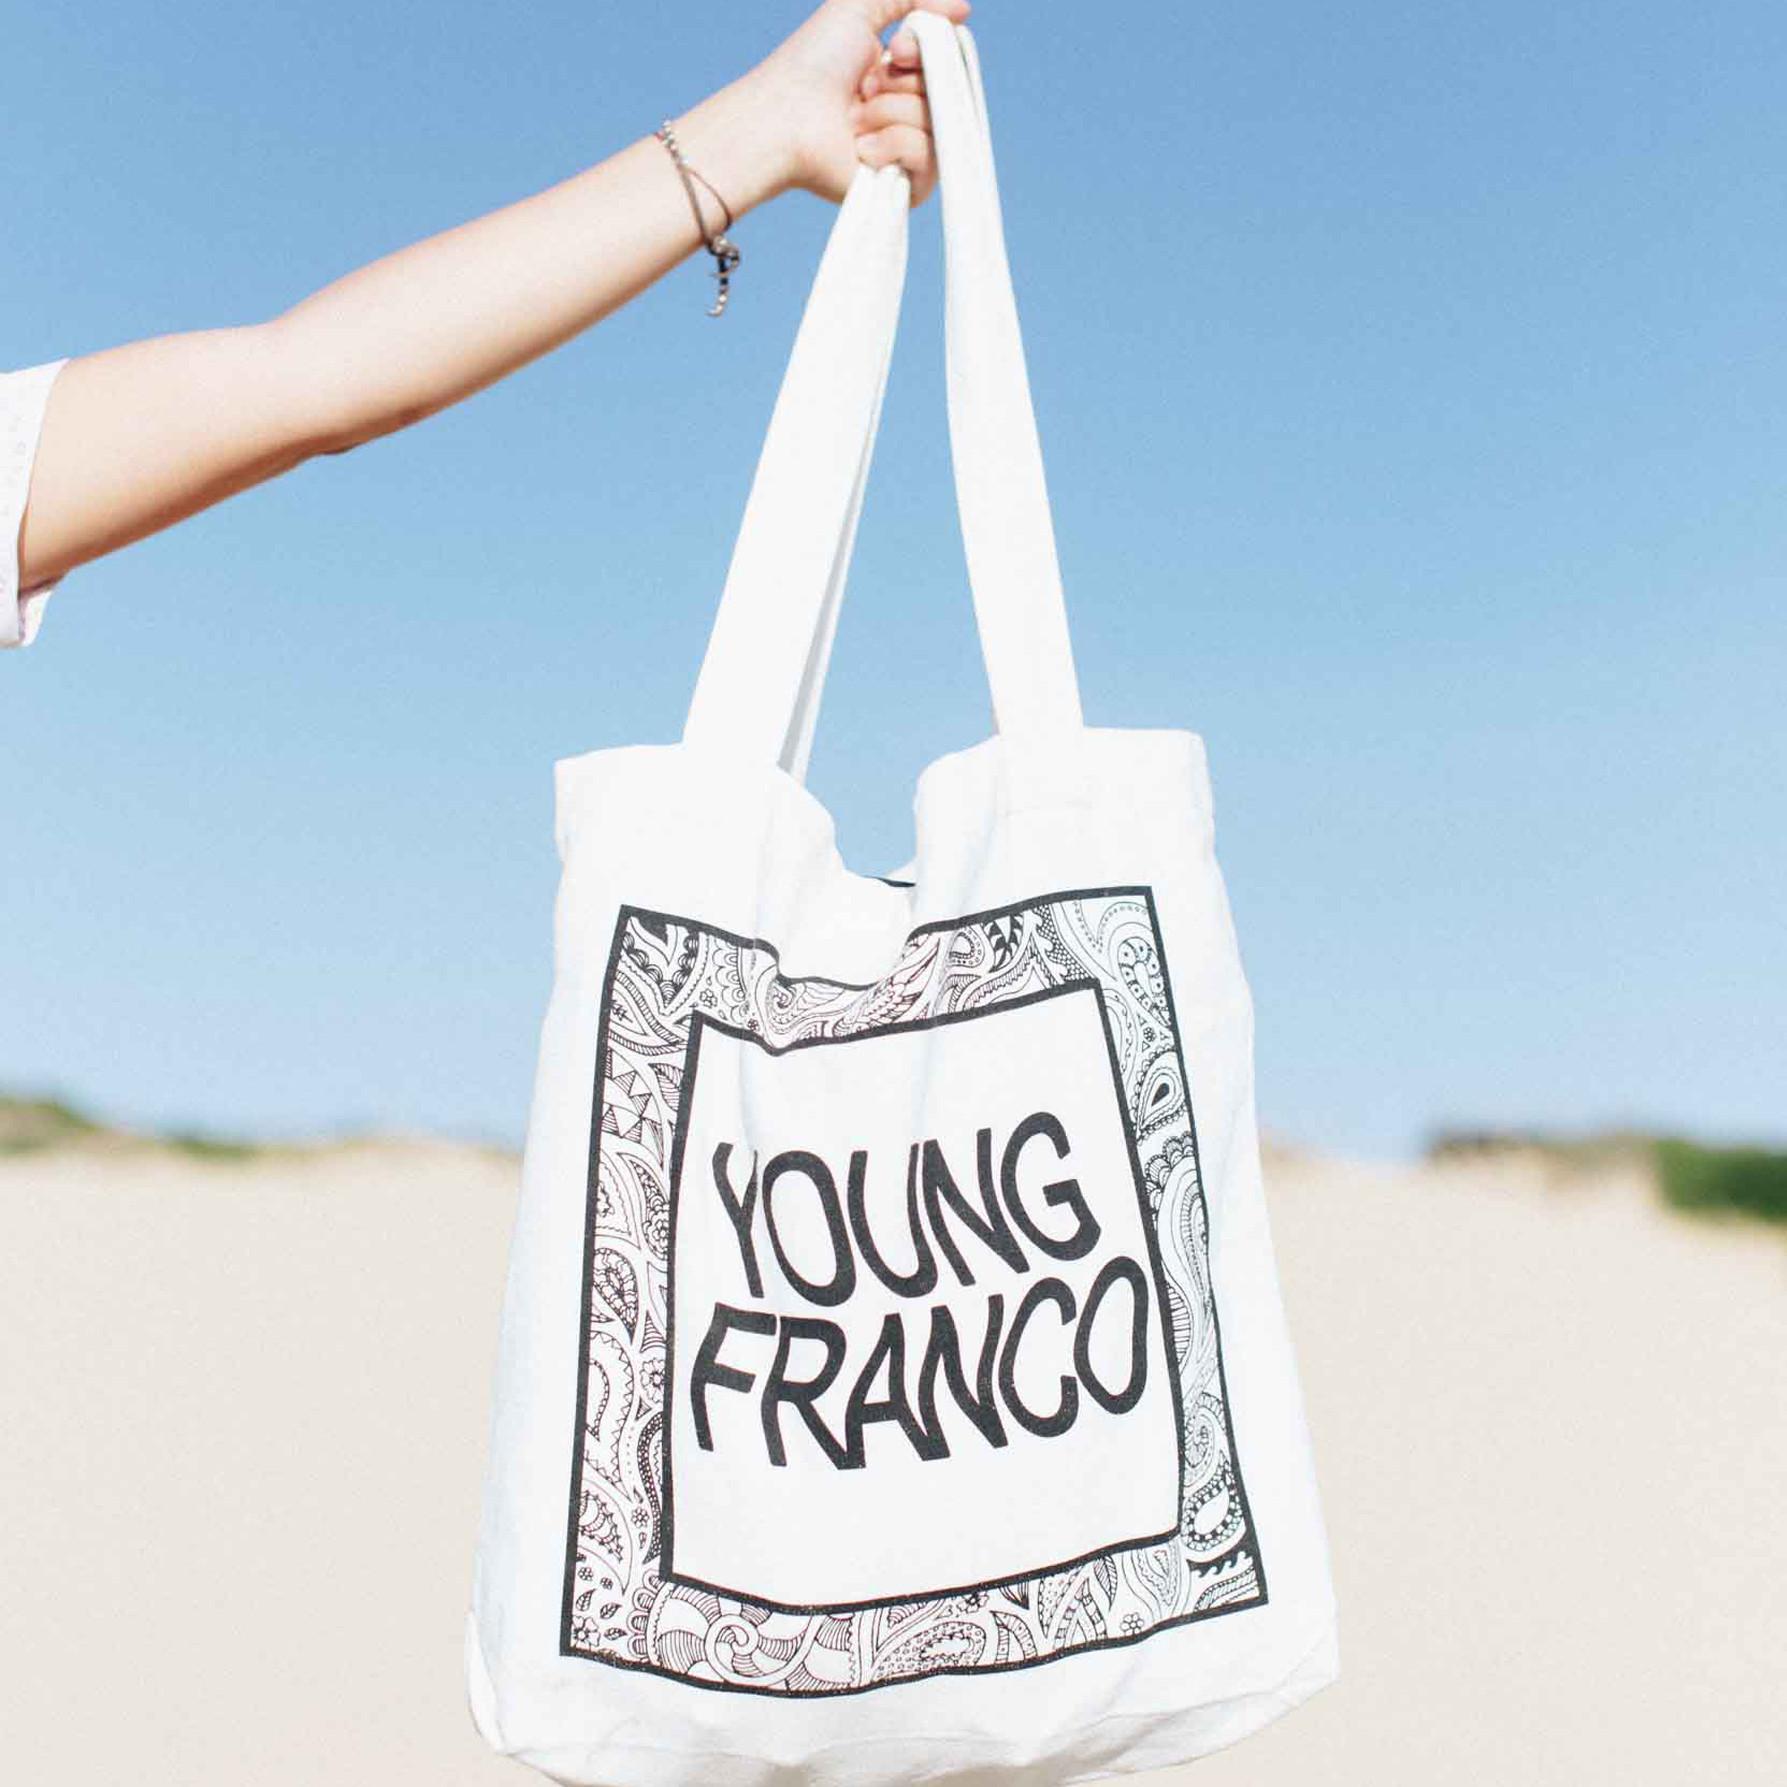 Young Franco - Tote Bag